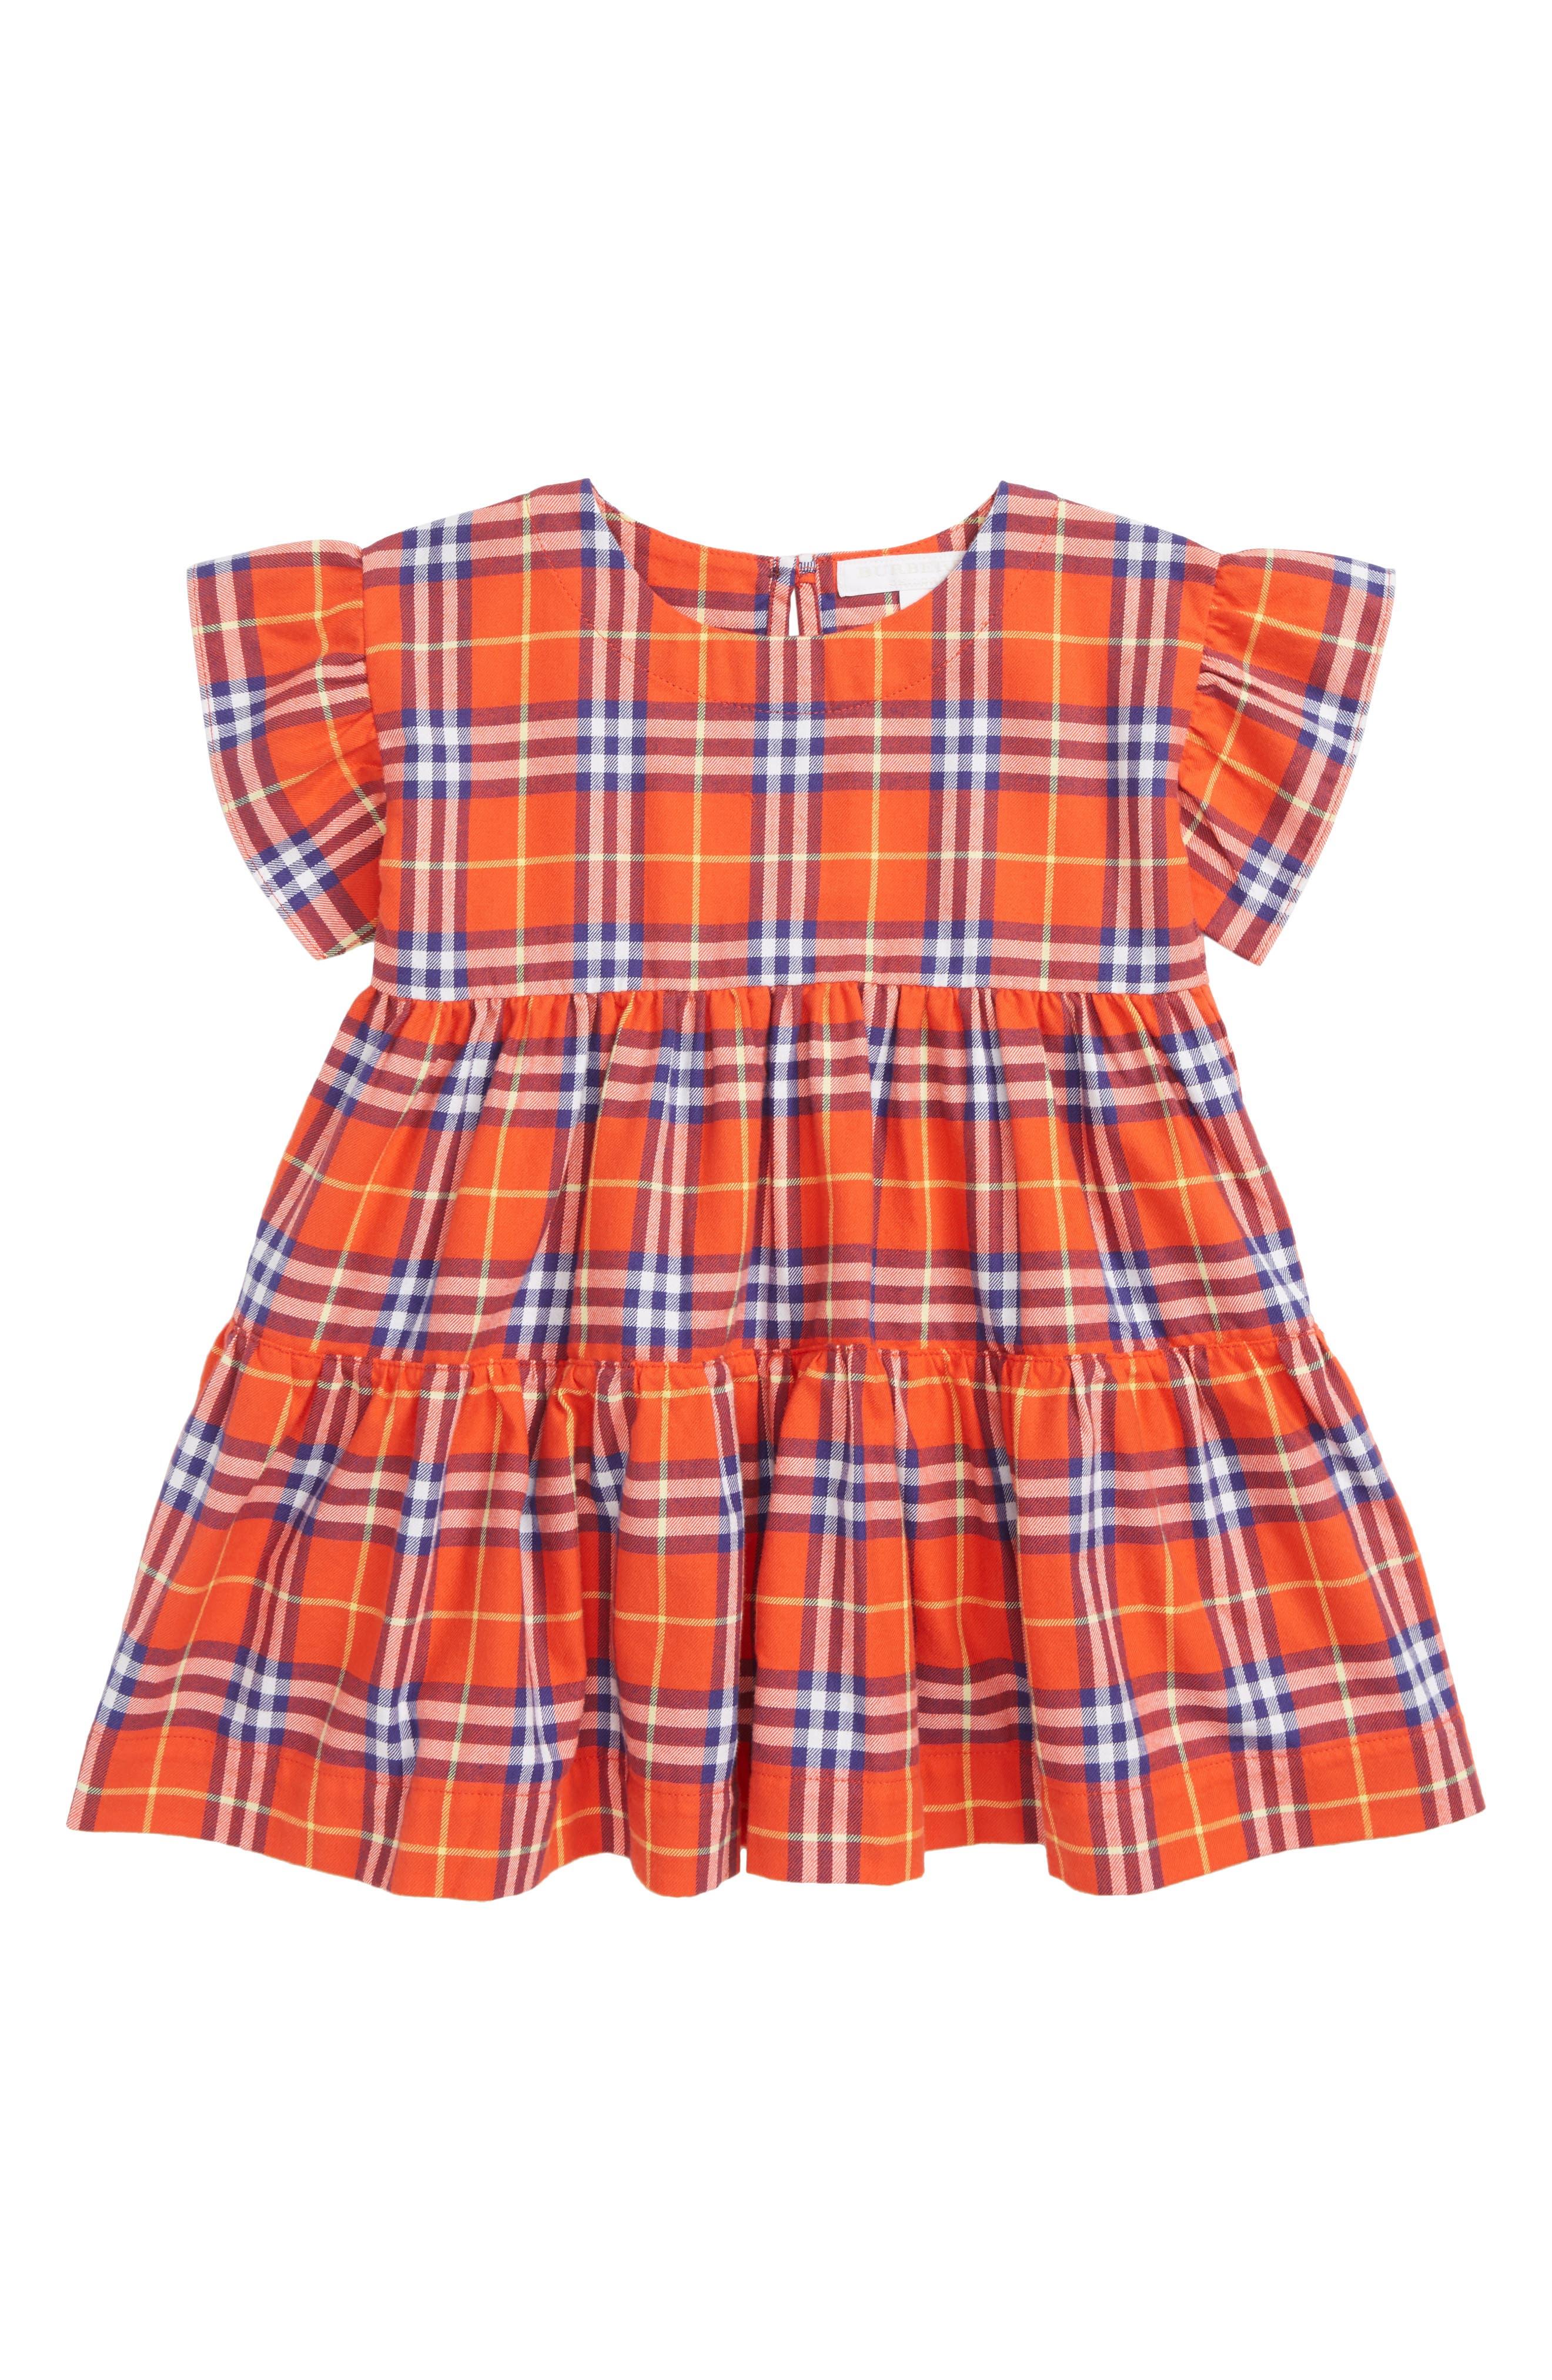 Alima Check Dress,                             Main thumbnail 1, color,                             ORANGE RED CHK